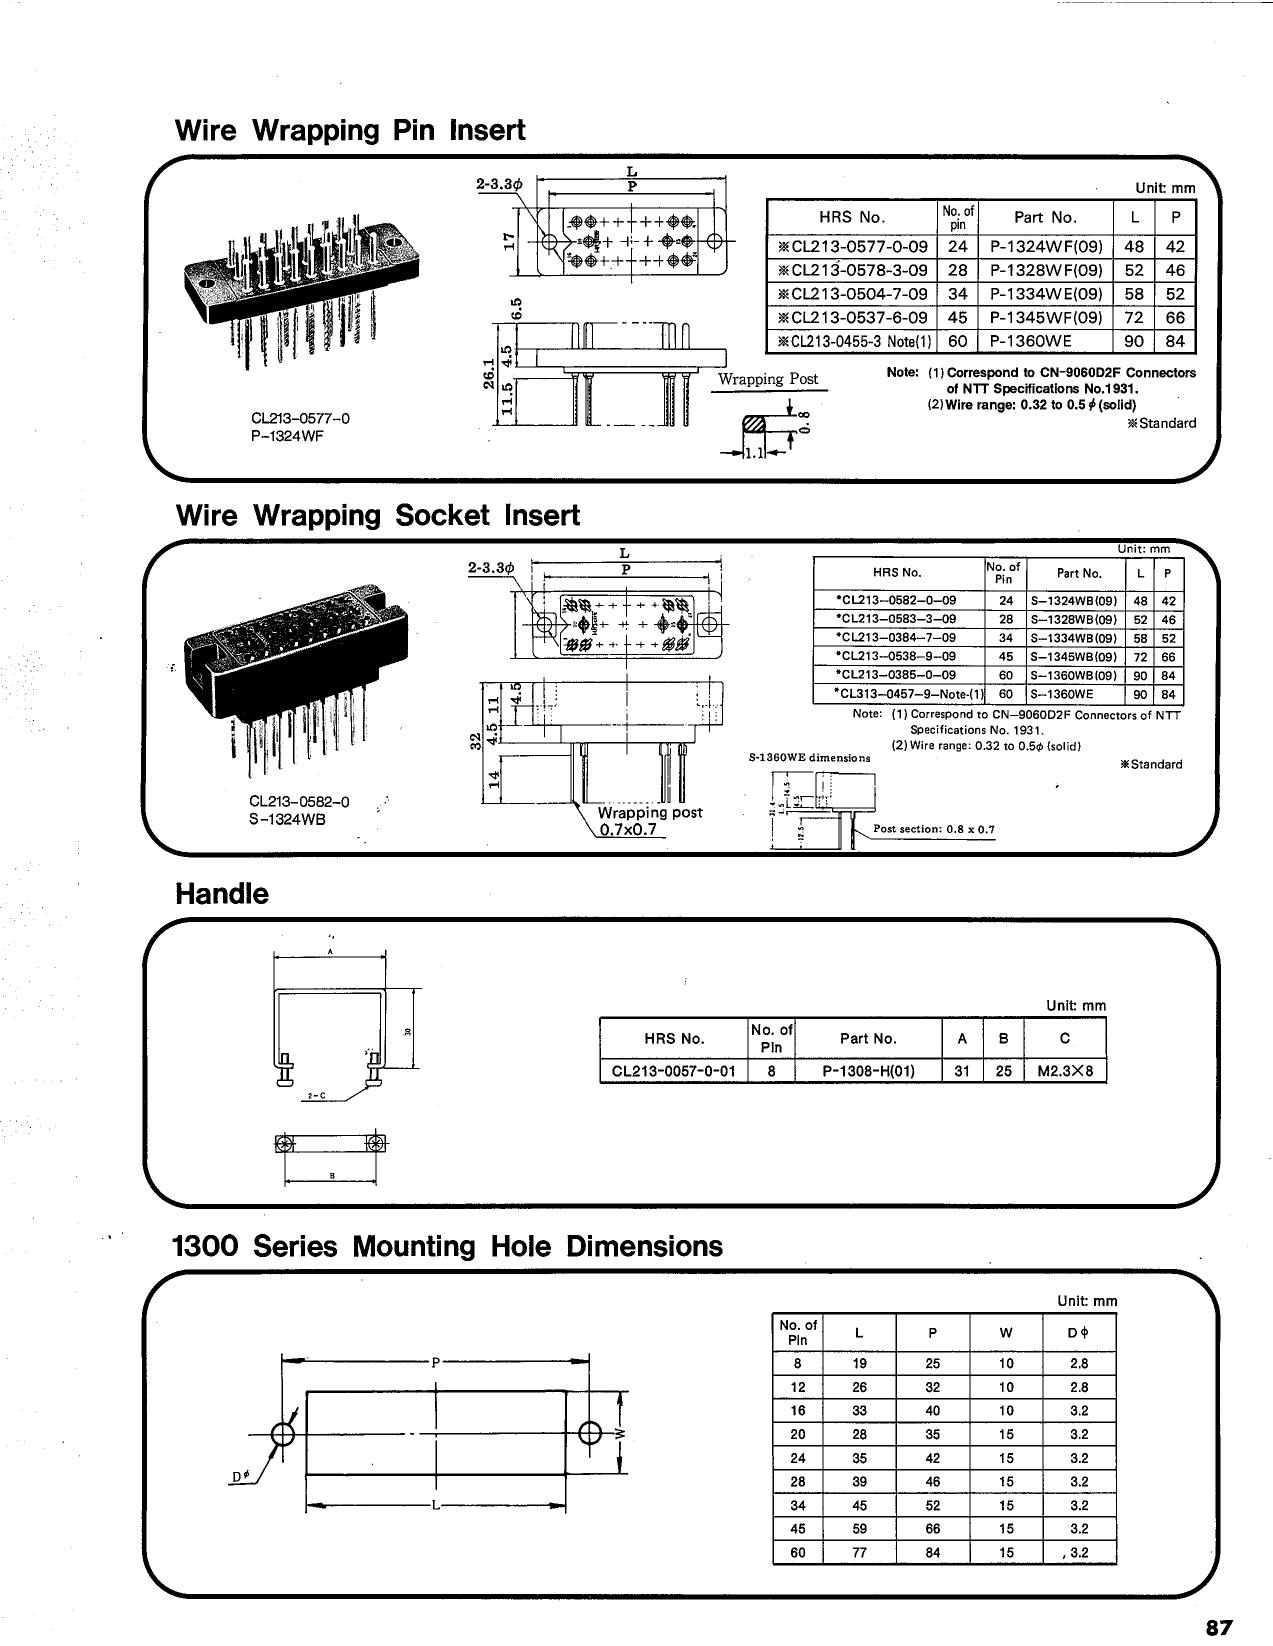 P-1334W-CE 電子部品, 半導体